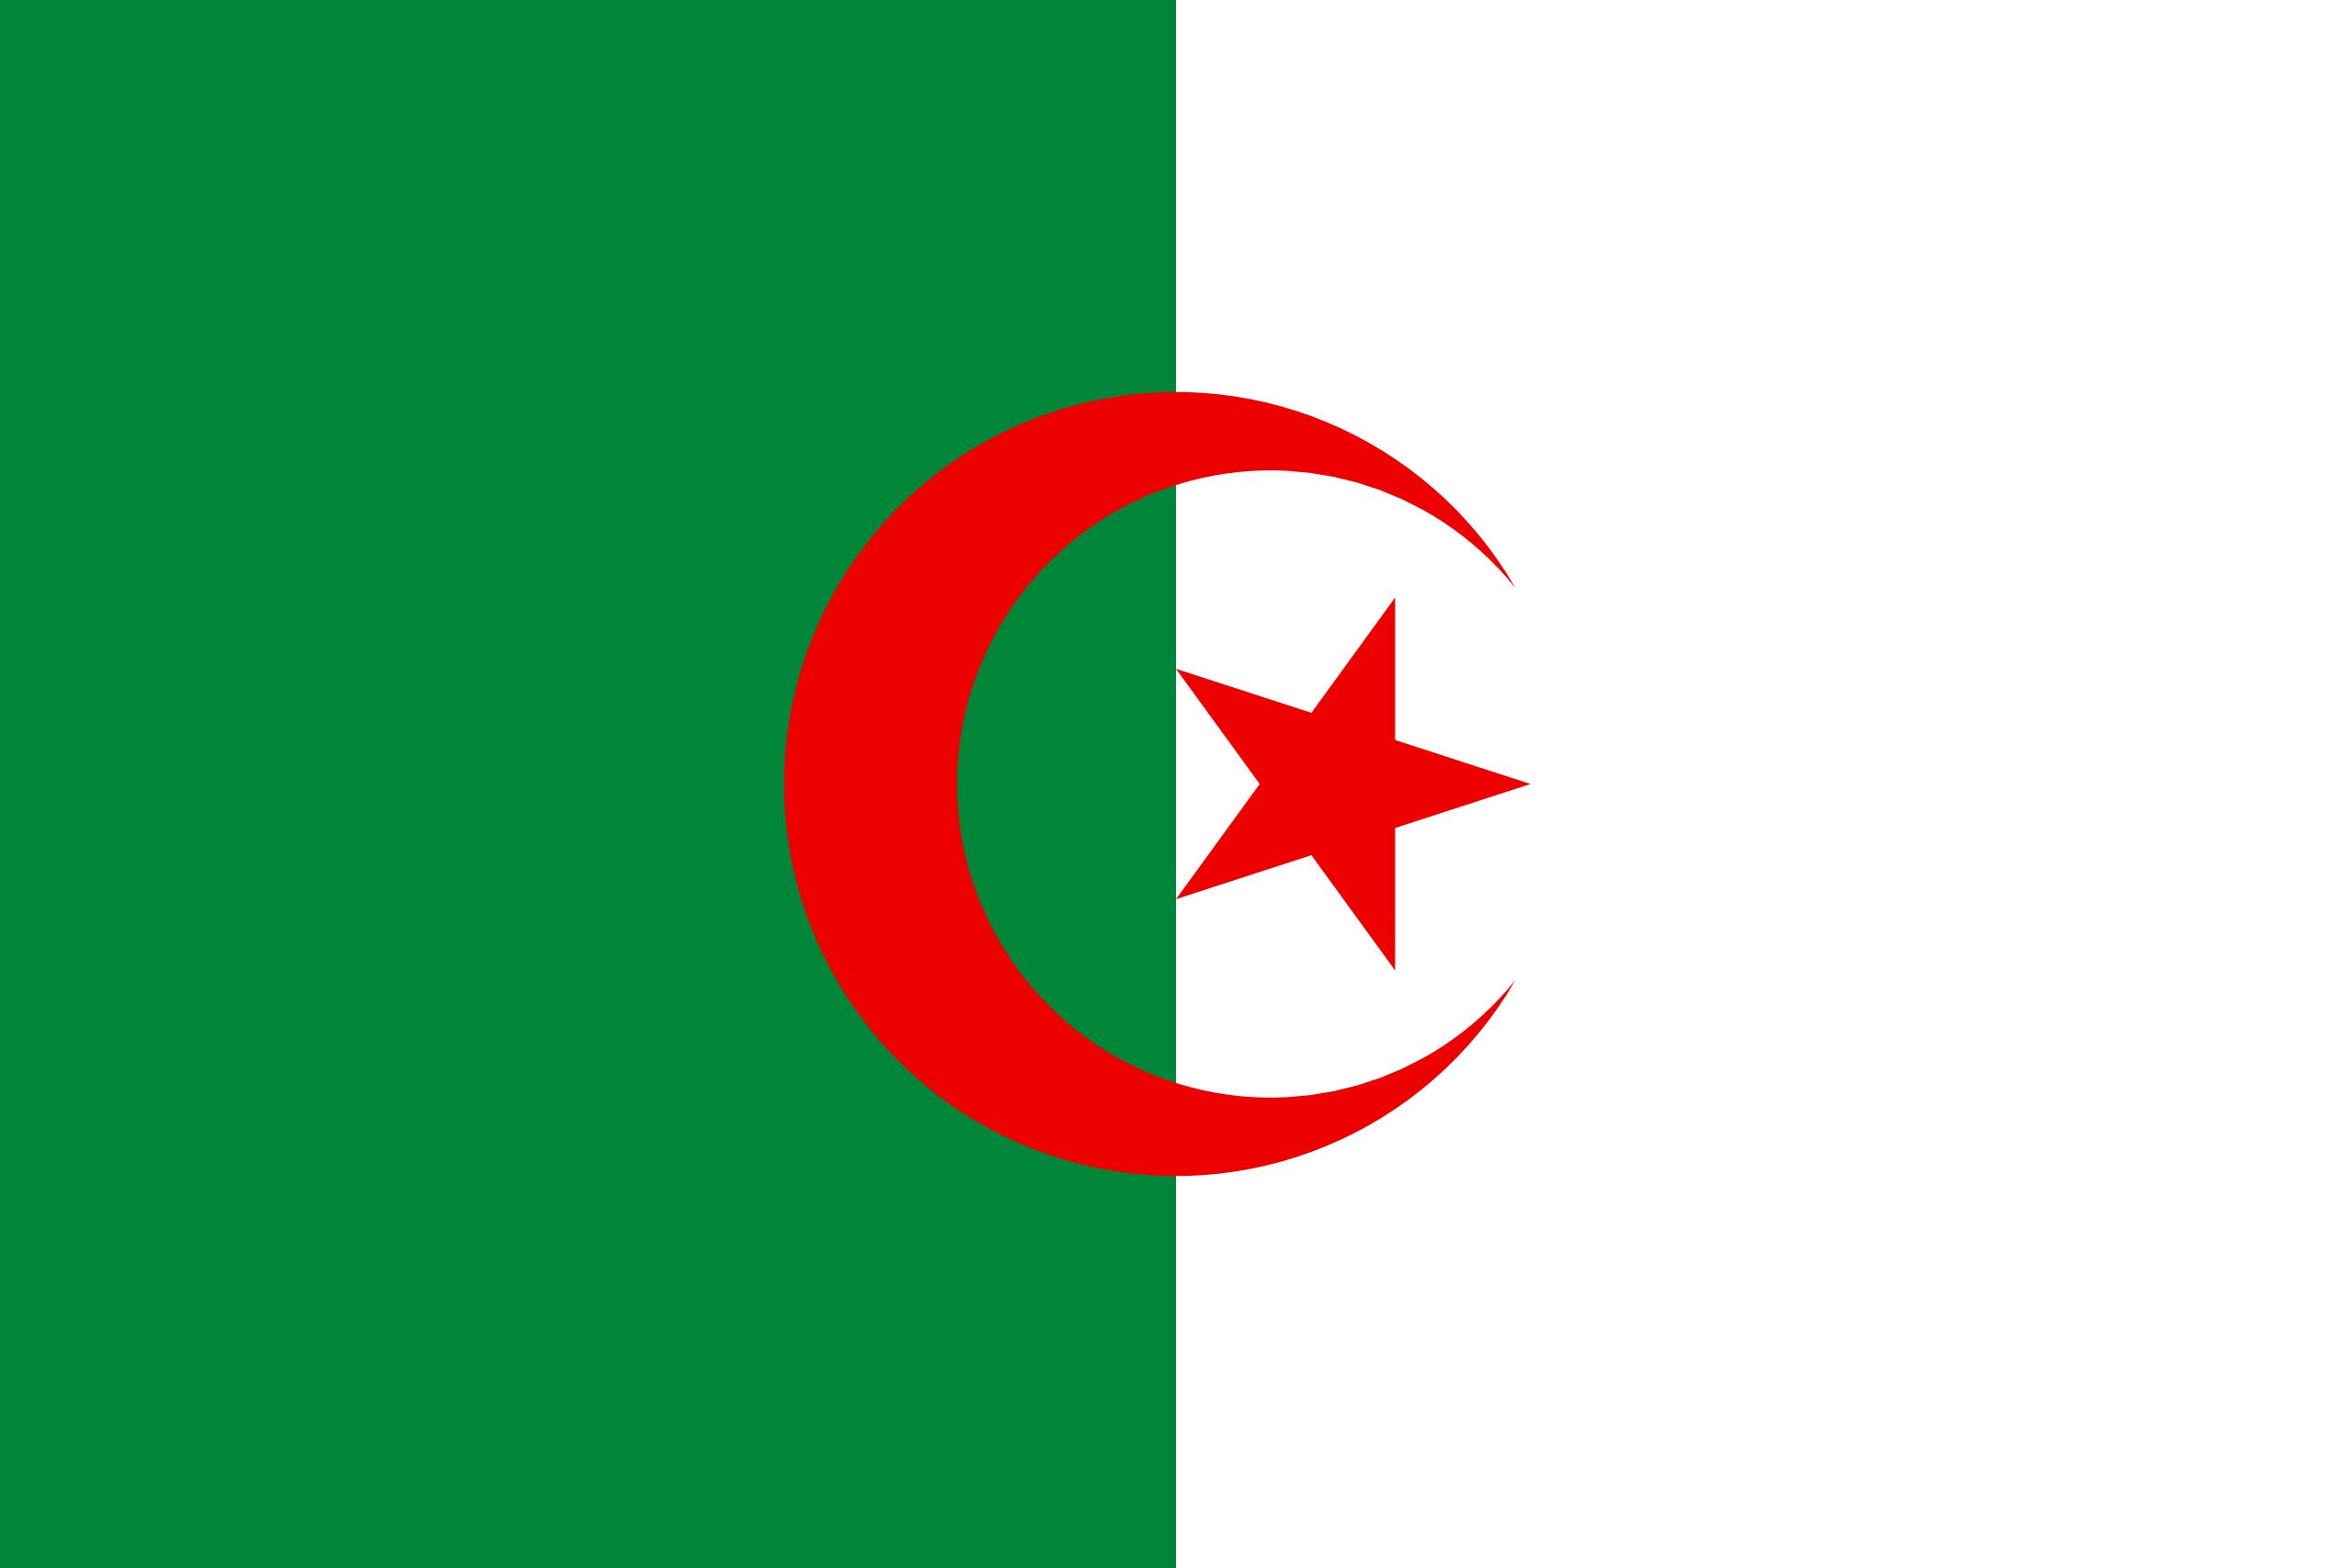 argelia, país, emblema, insignia, シンボル - HD の壁紙 - 教授-falken.com